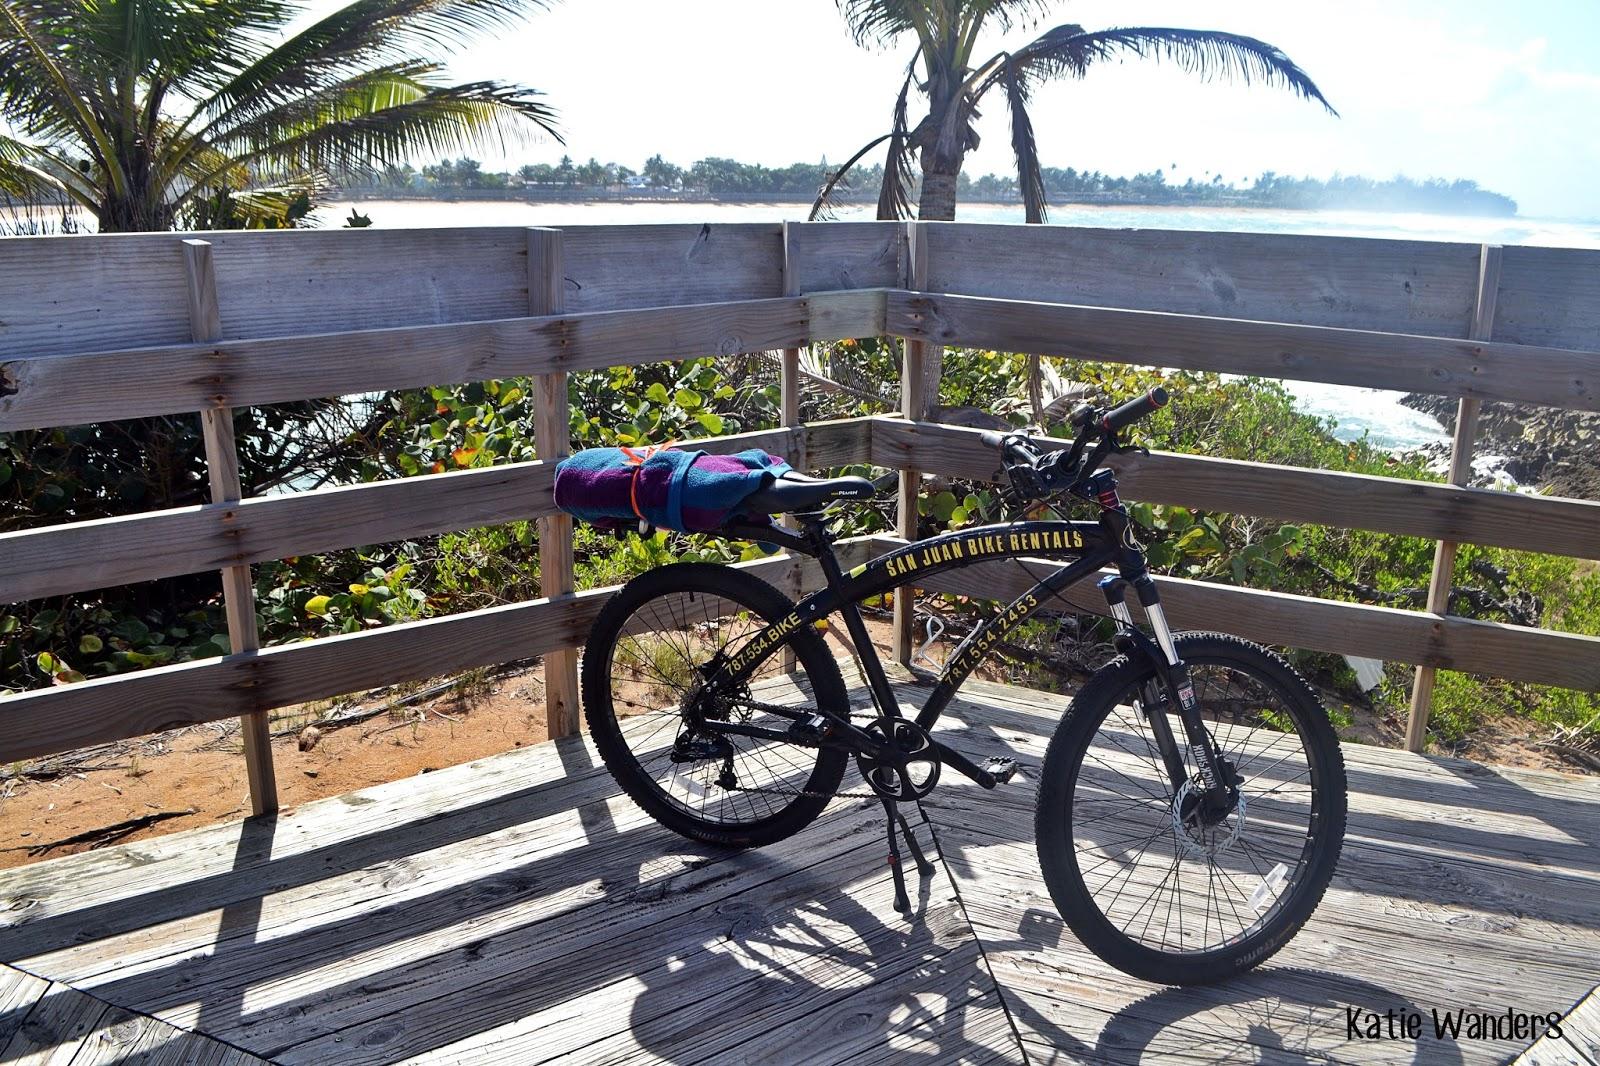 Katie Wanders Biking The Boardwalk Pinones Puerto Rico